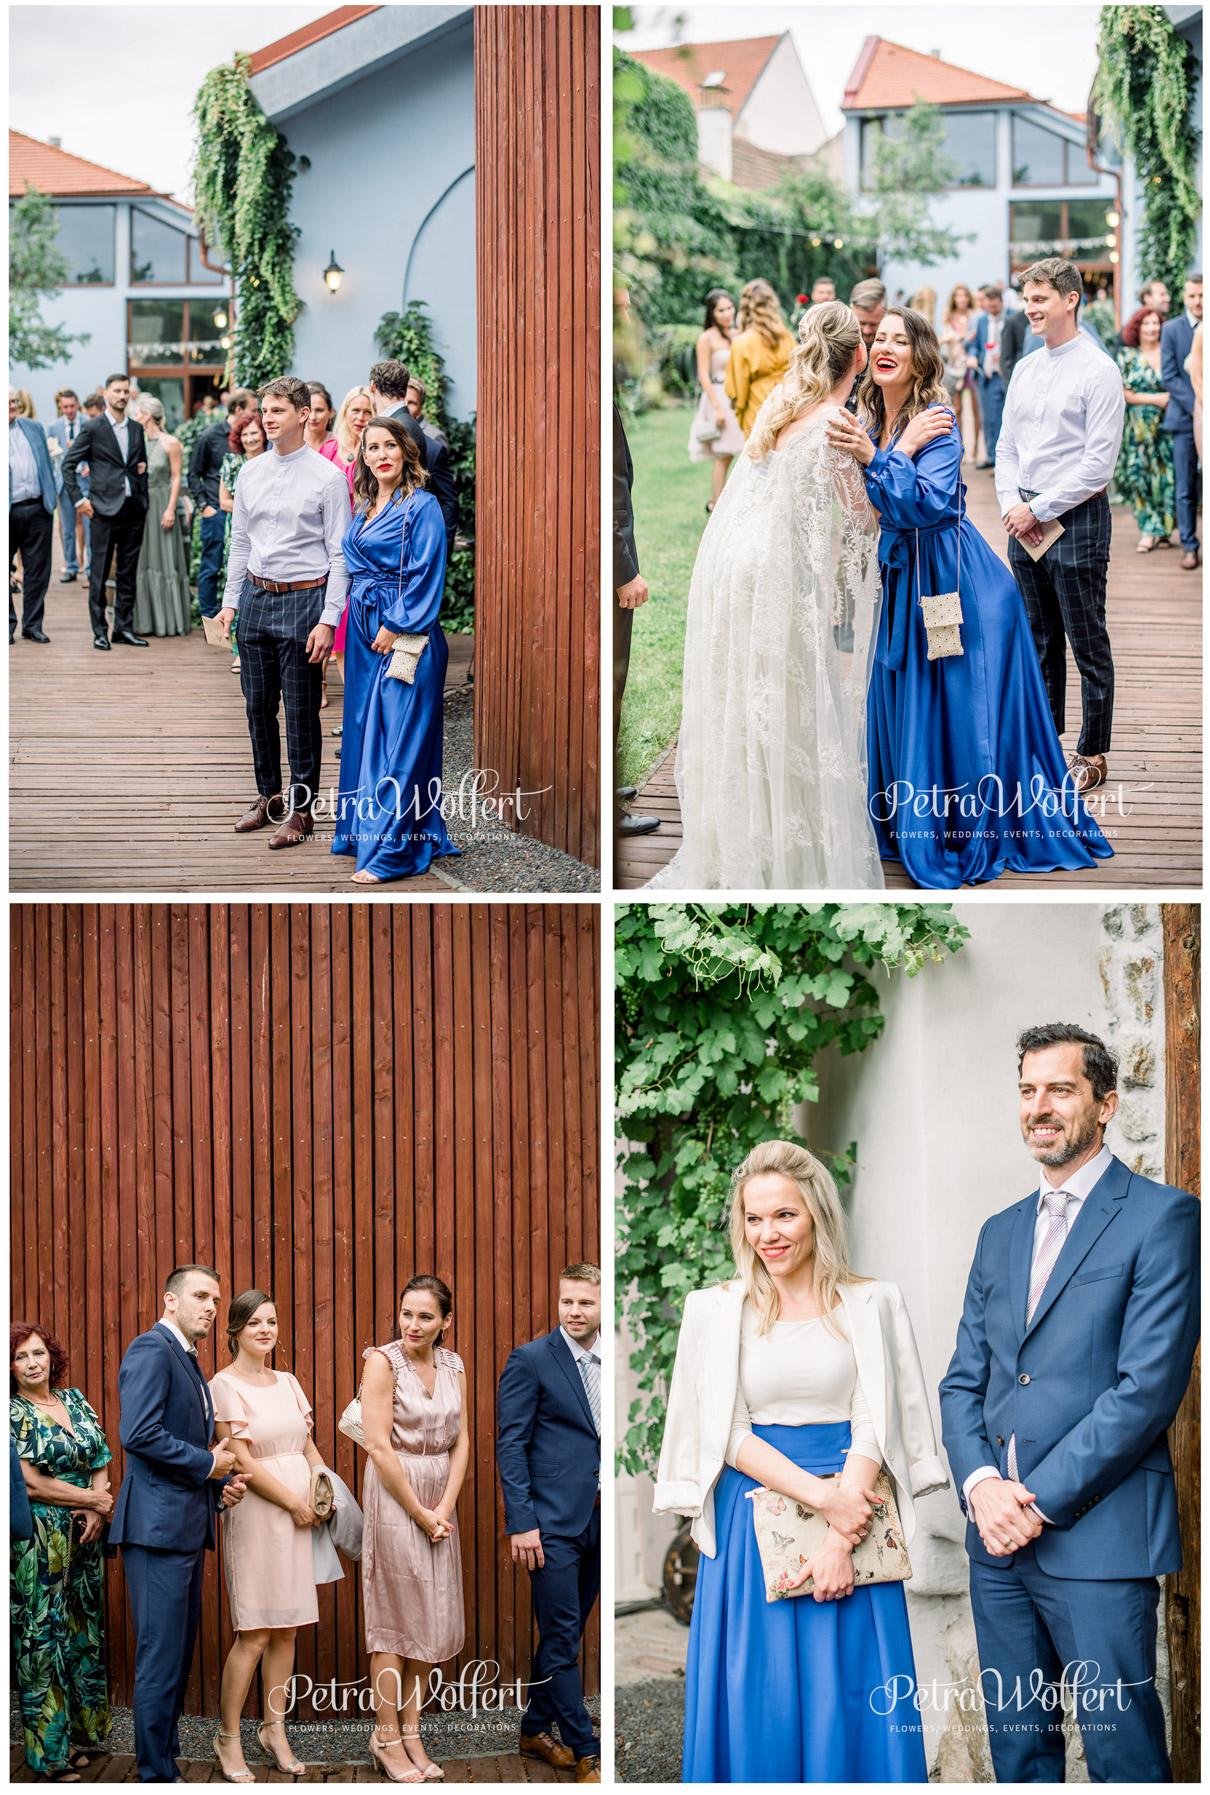 Svadba, Nina a Michal, Petra Wolfert